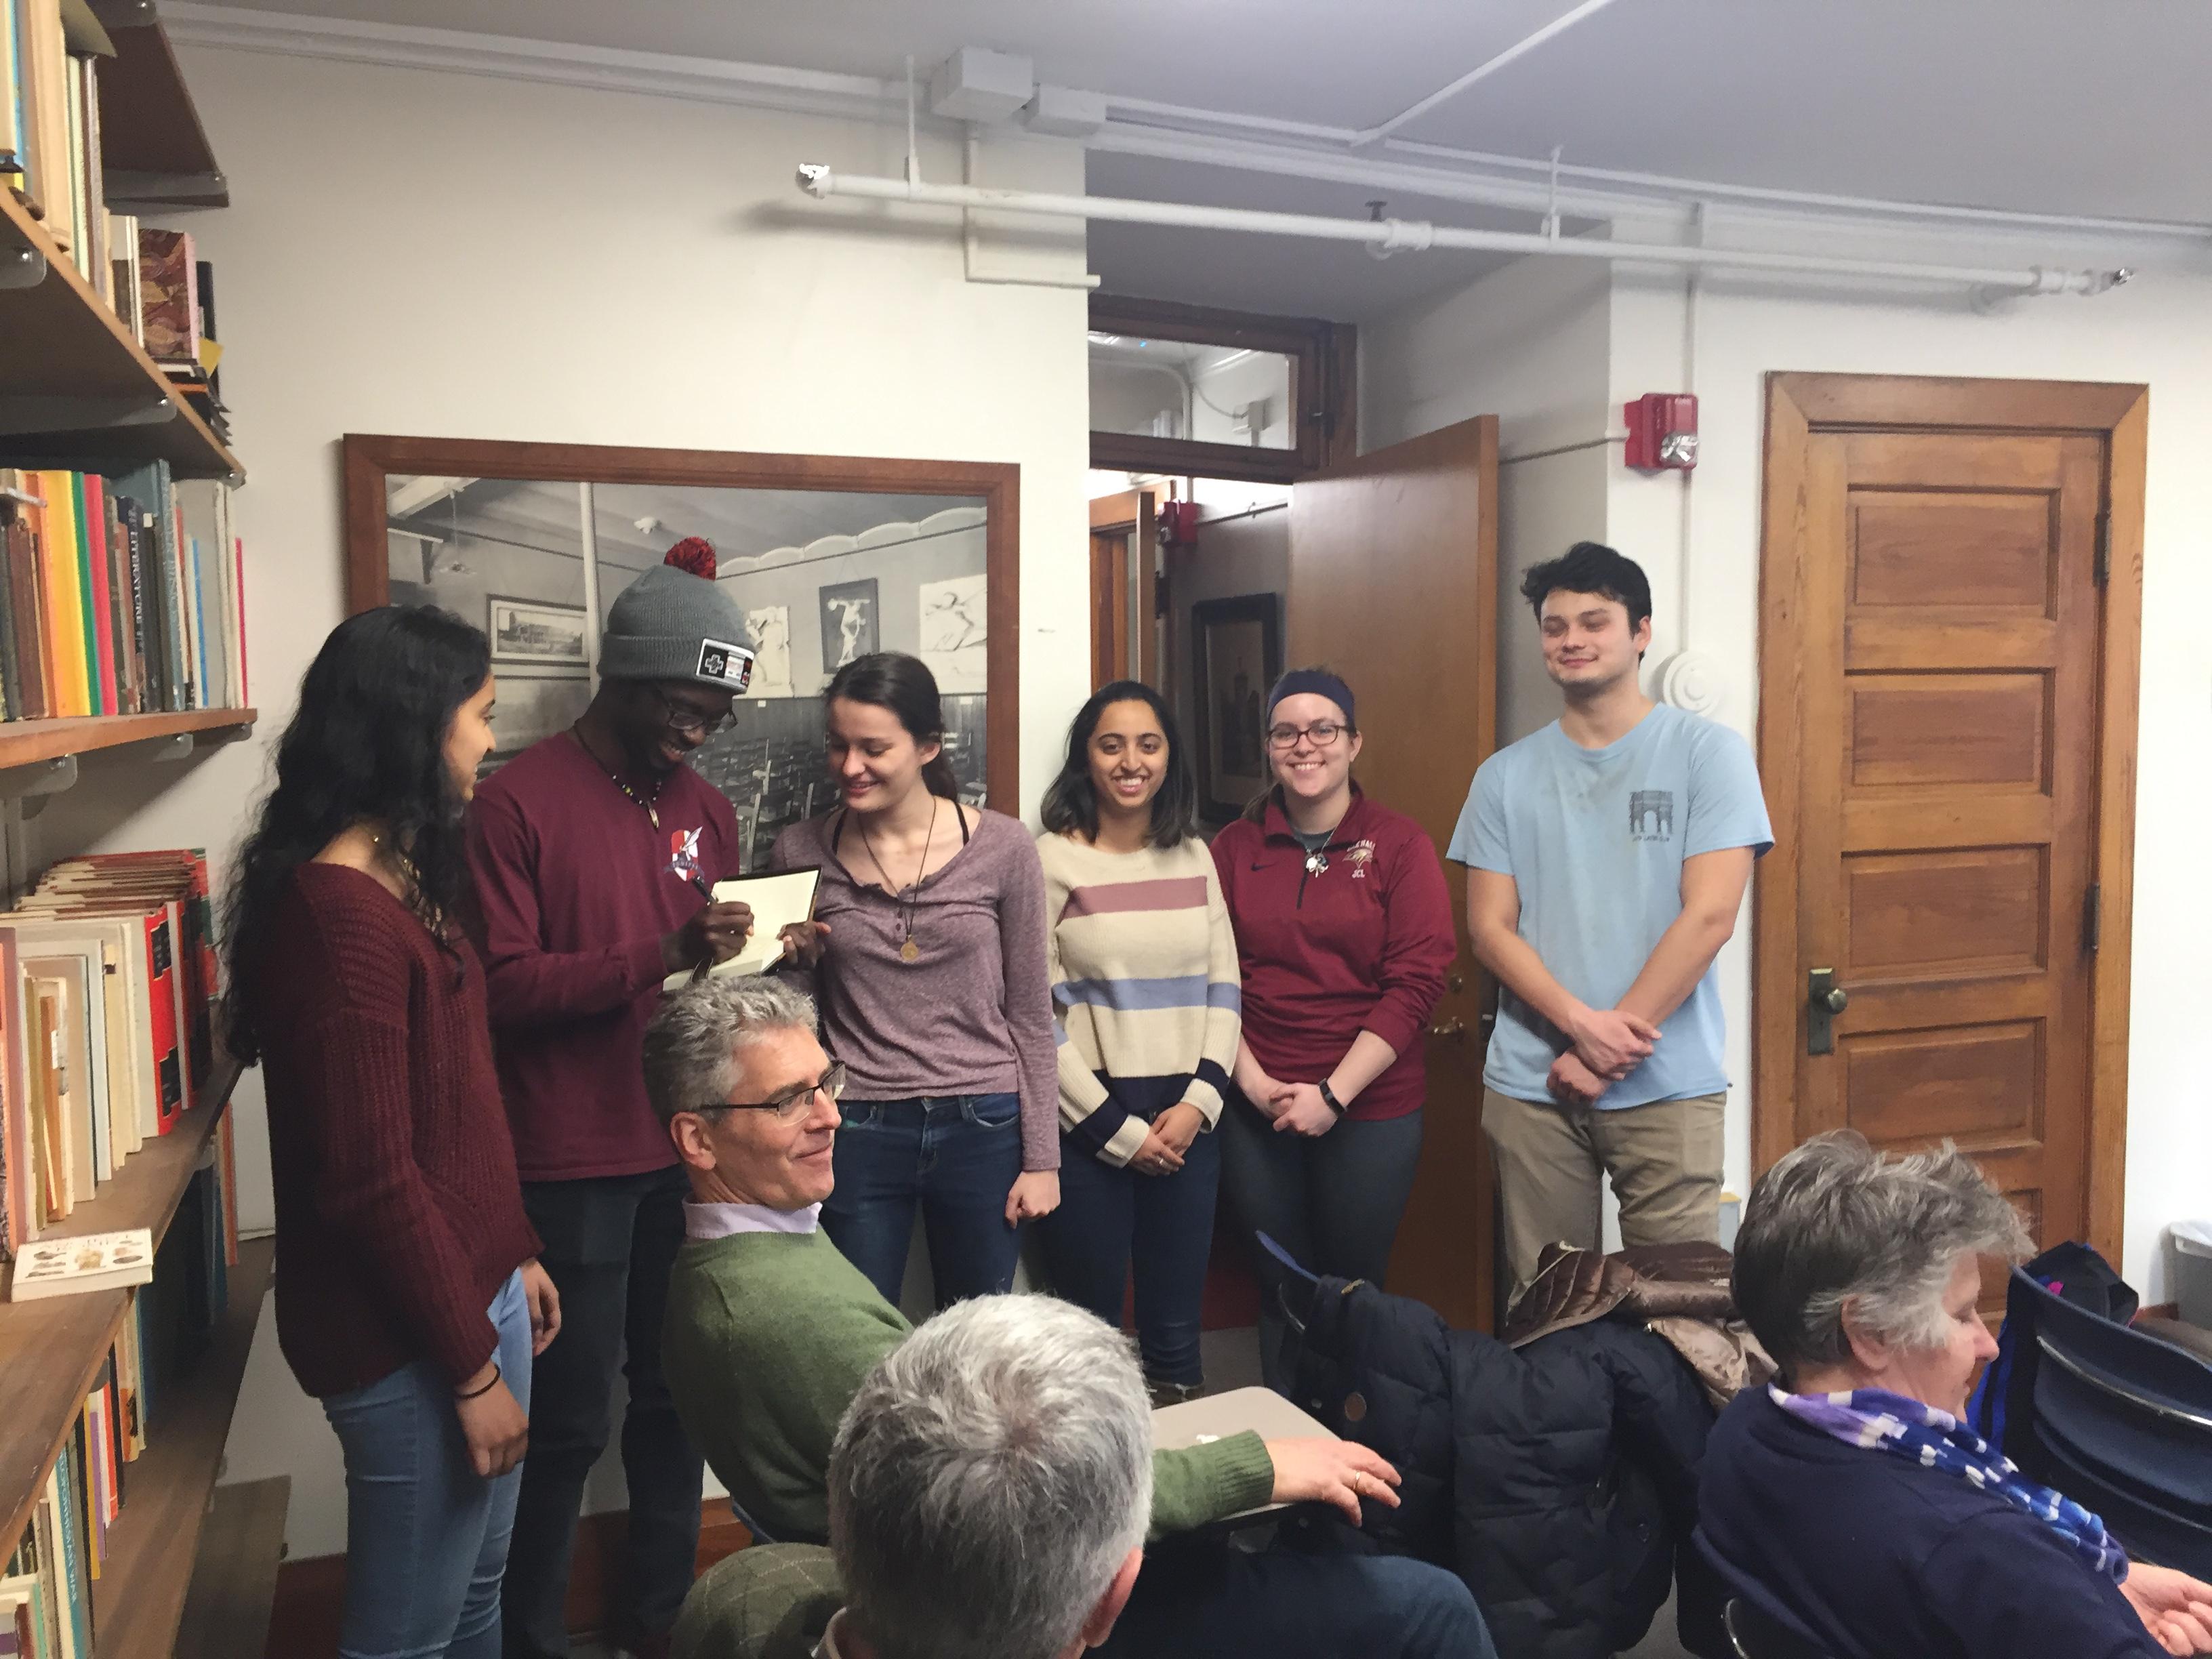 New members of Eta Sigma Phi sign the member register (from L to R: Asha Ravichadran, Nana Yorke, Jillian White, Saloni Lad, Emma Ries, and Joshua Breckenridge)